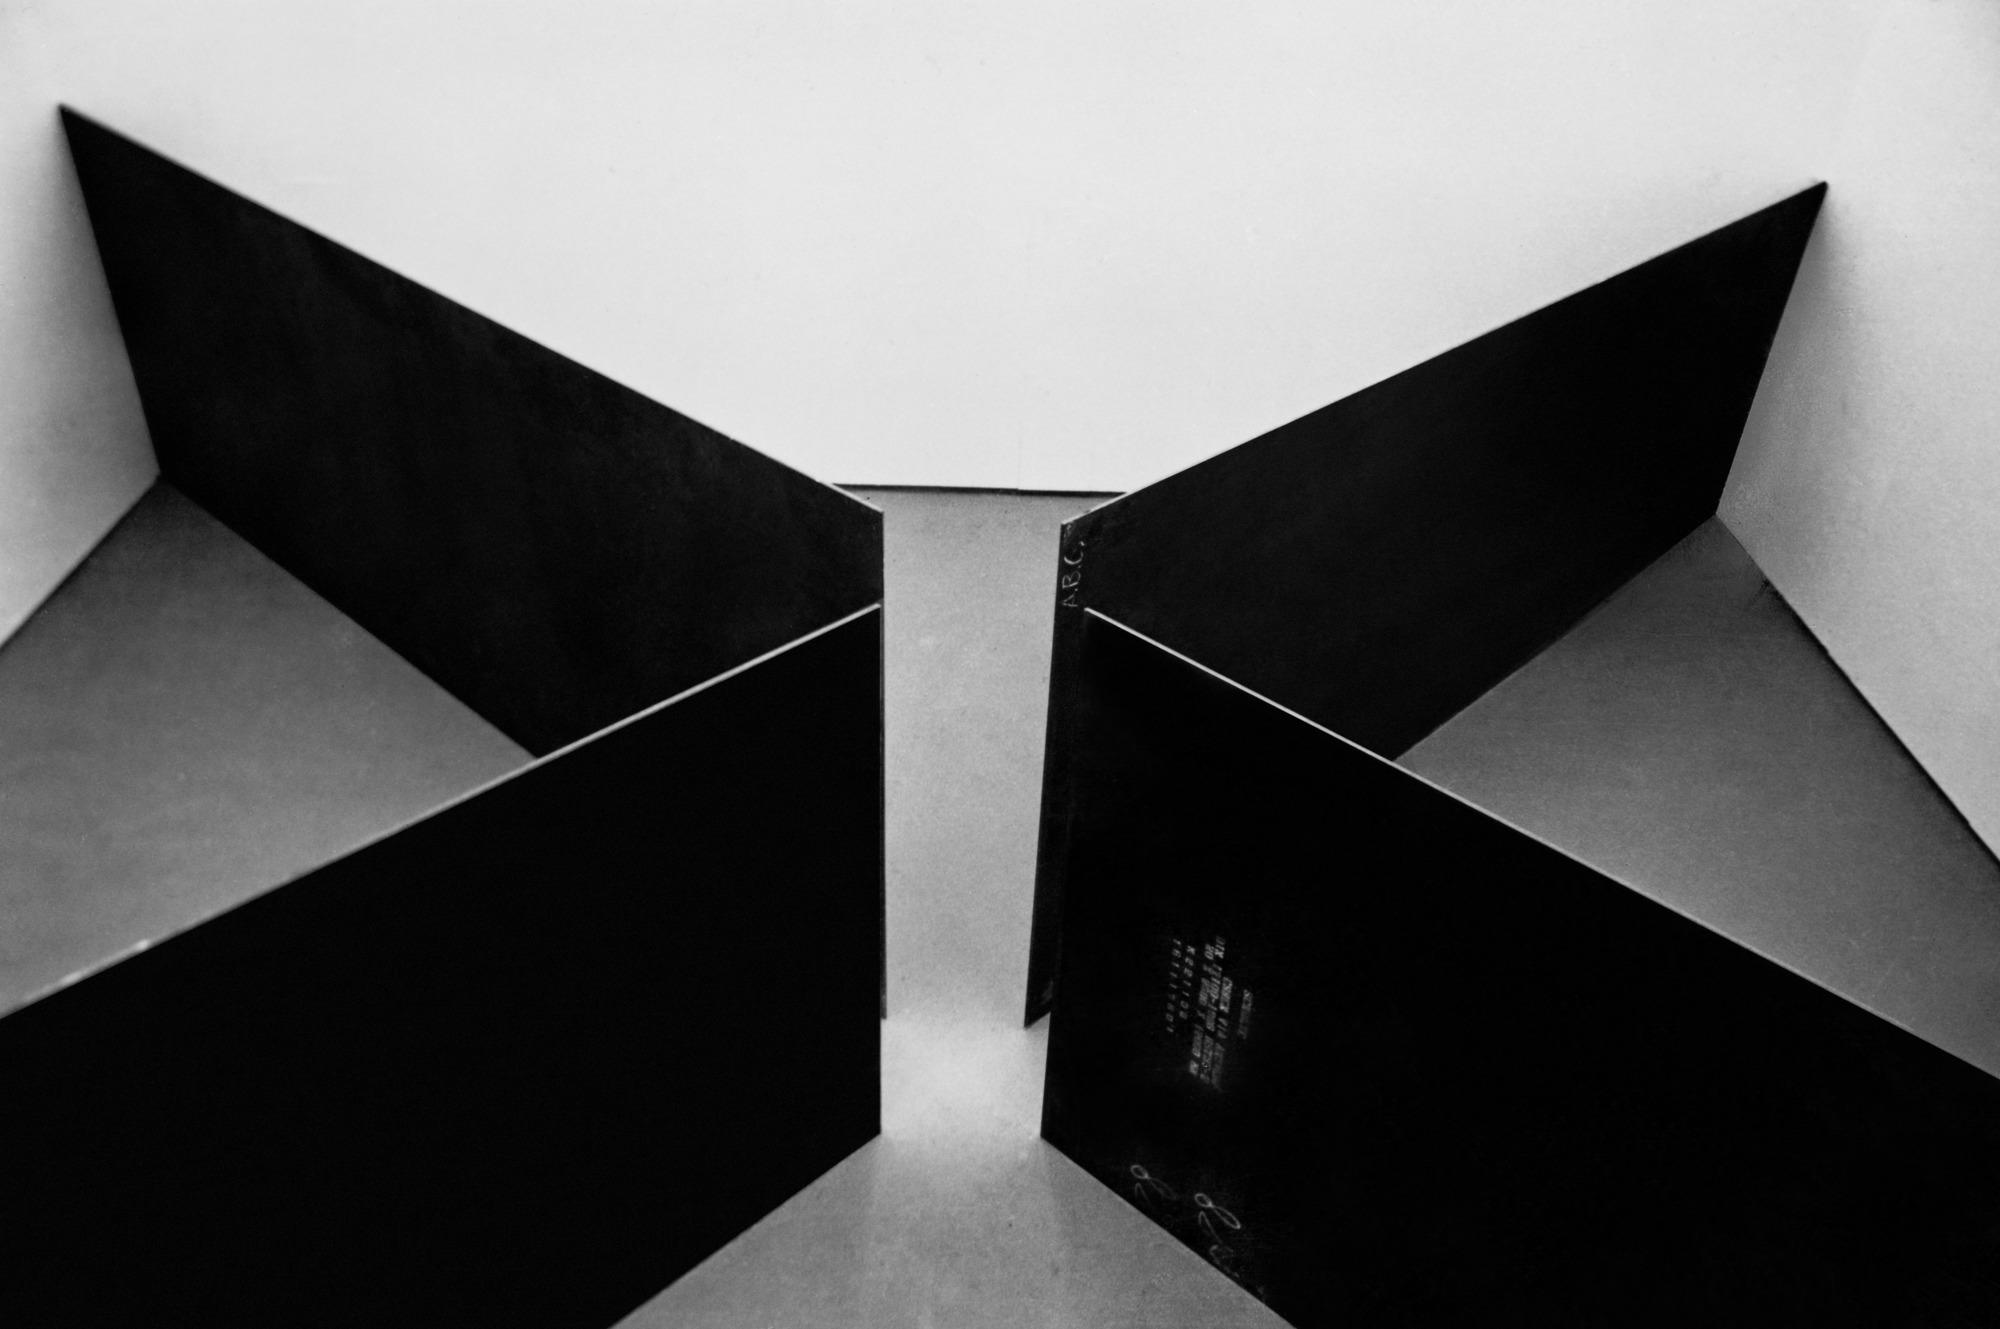 Richard Serra, Circuit, 1972